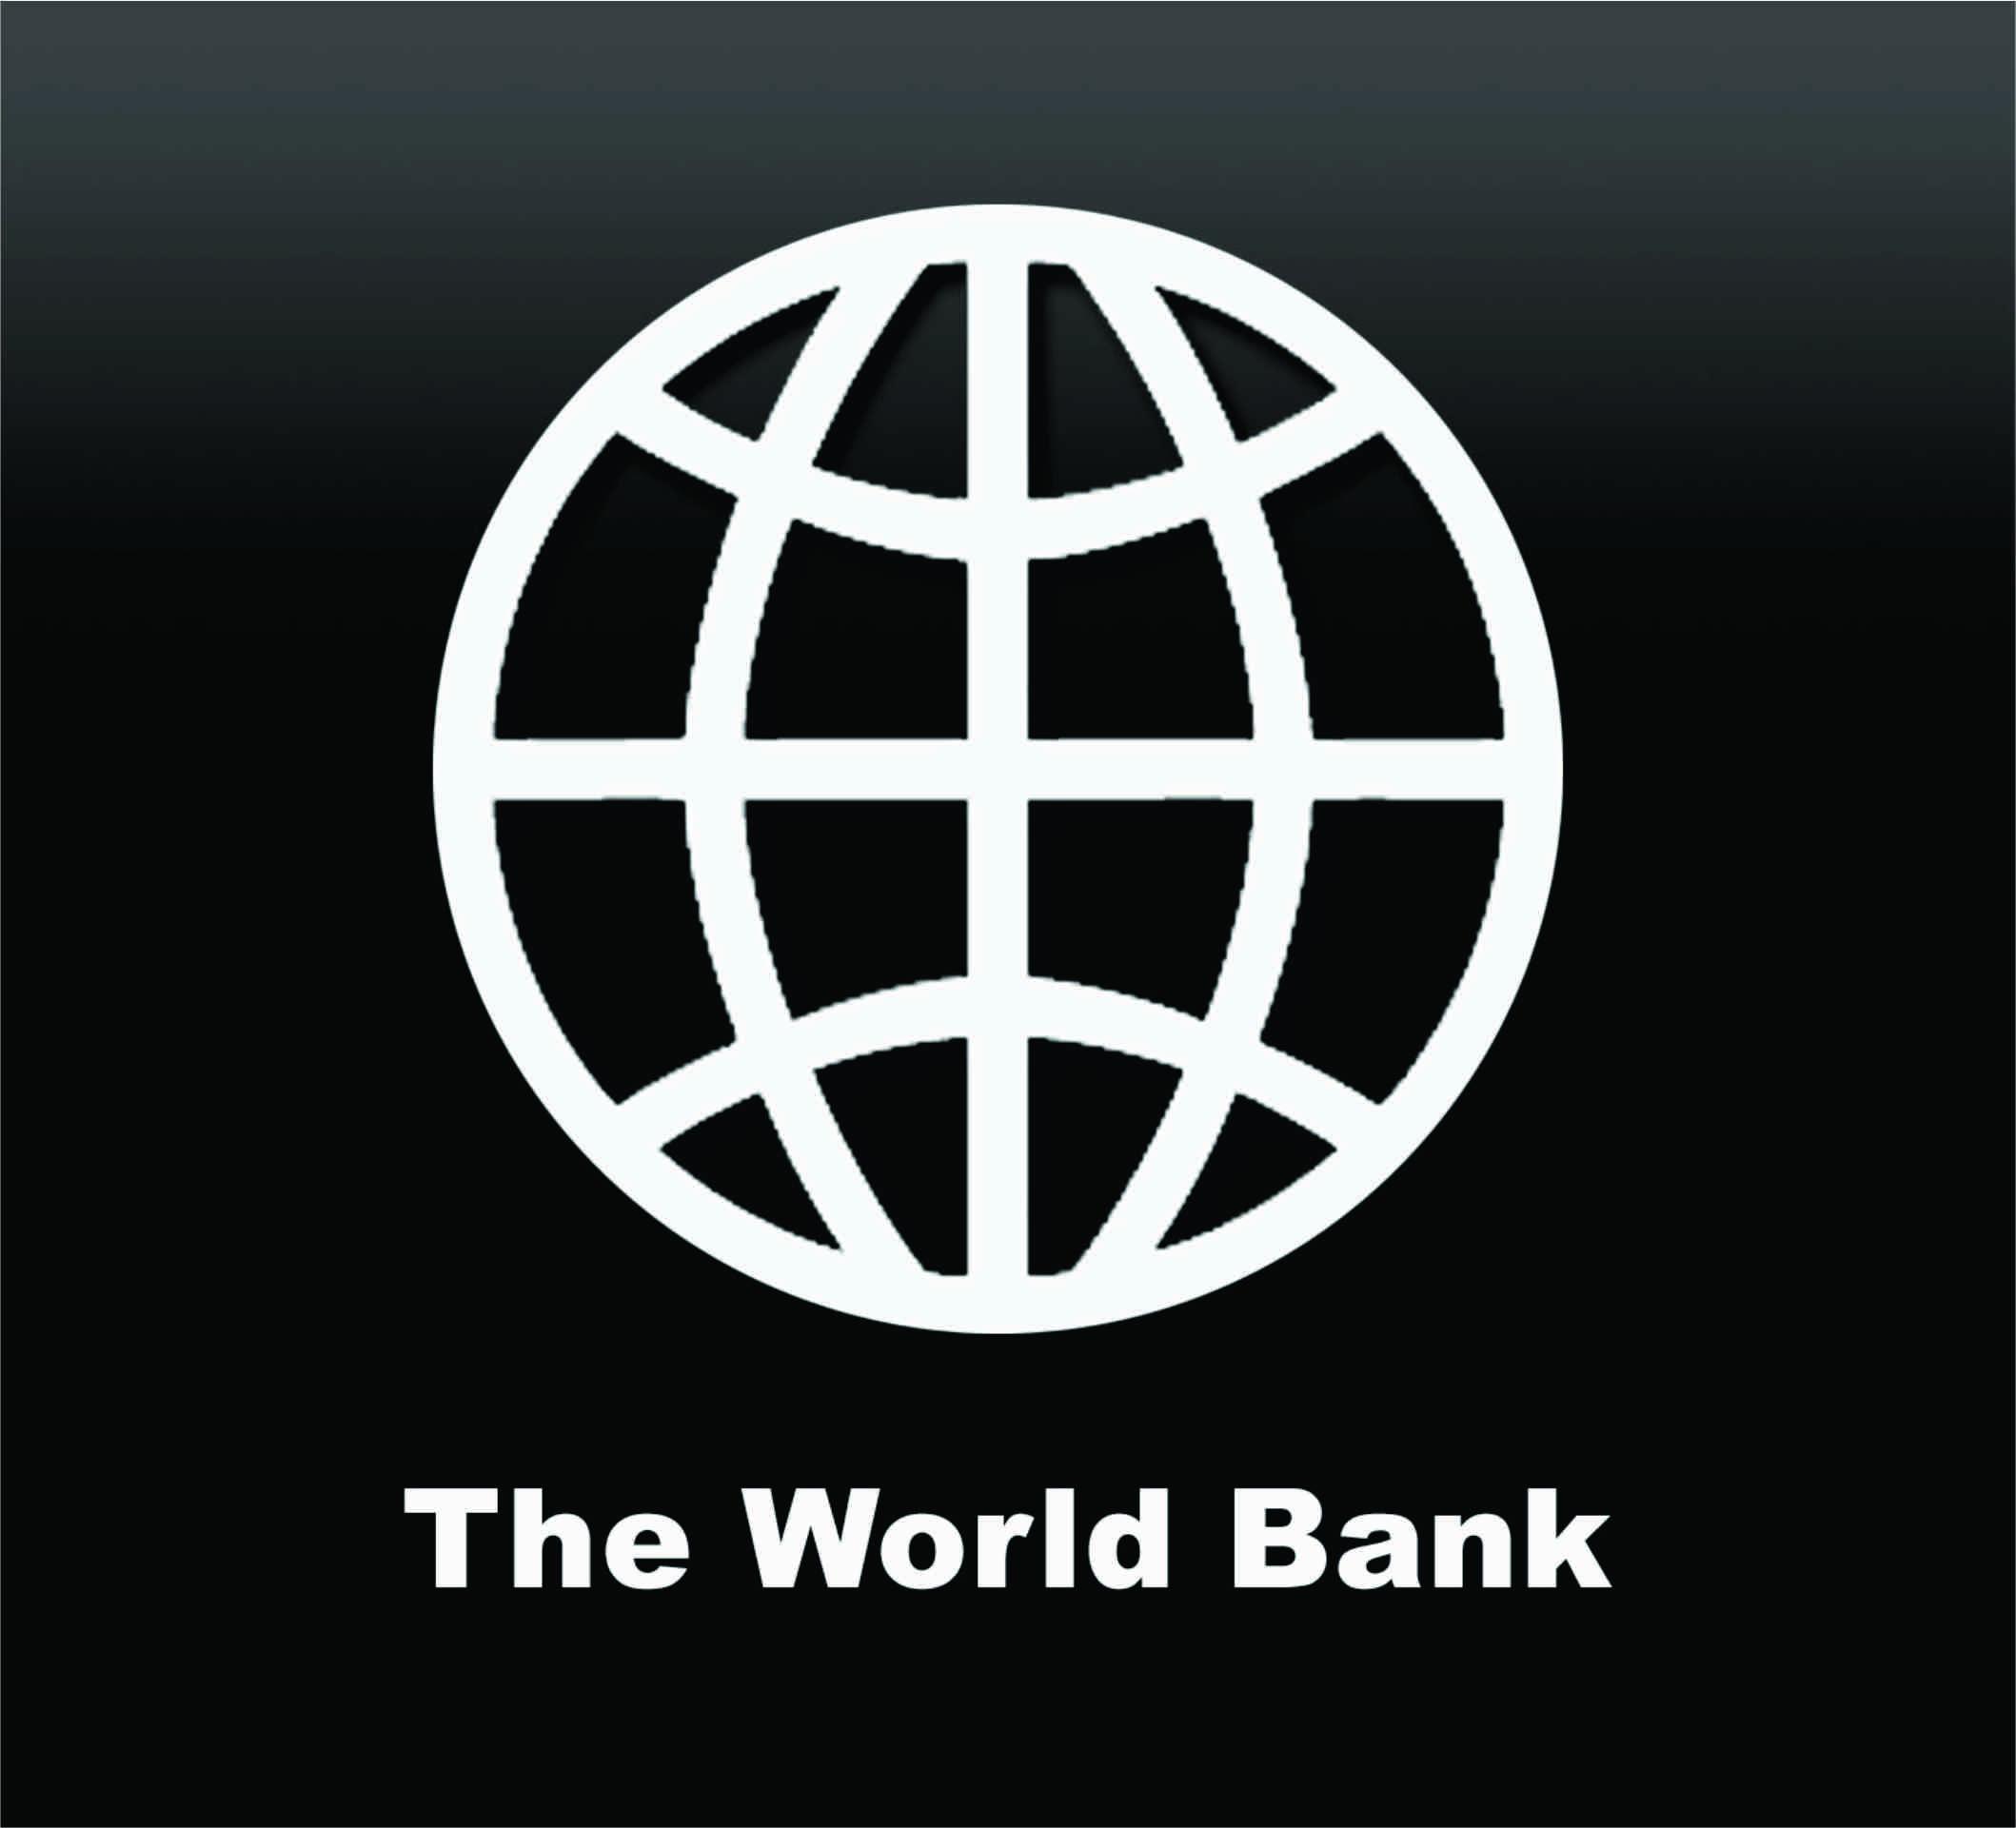 C:\Users\Alina\Desktop\world-bank.jpg